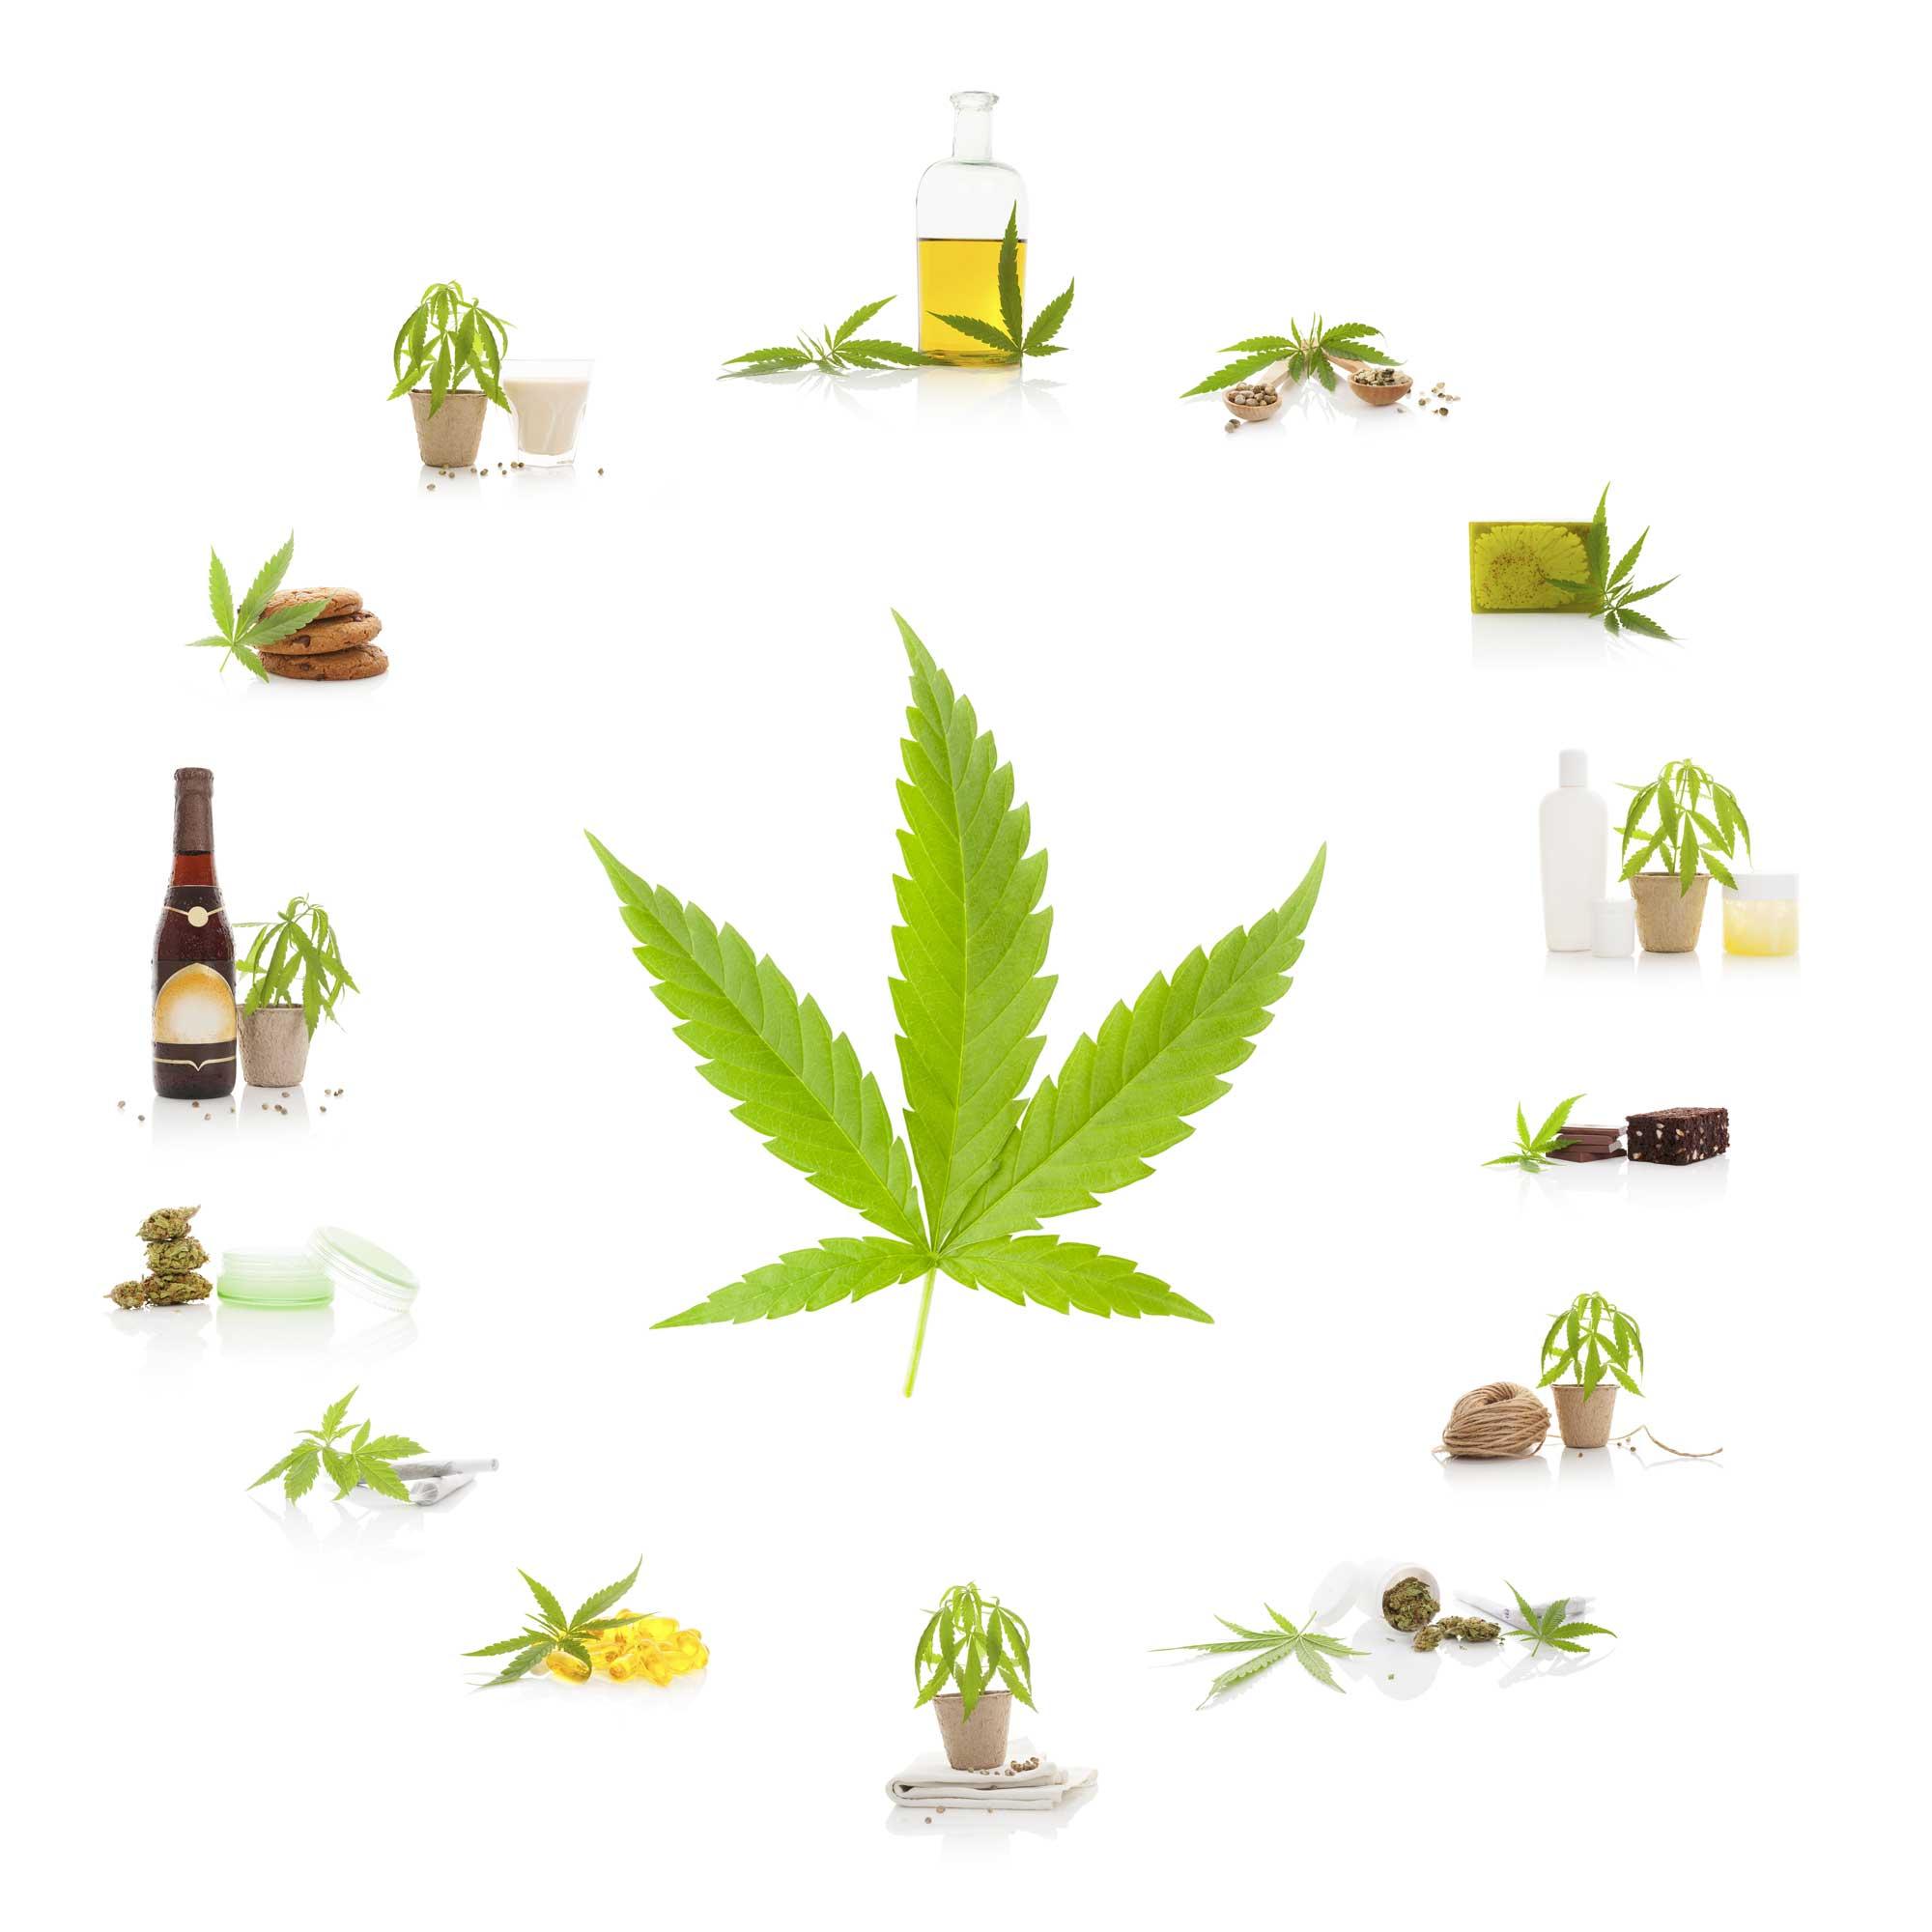 Cannabinoids Facts